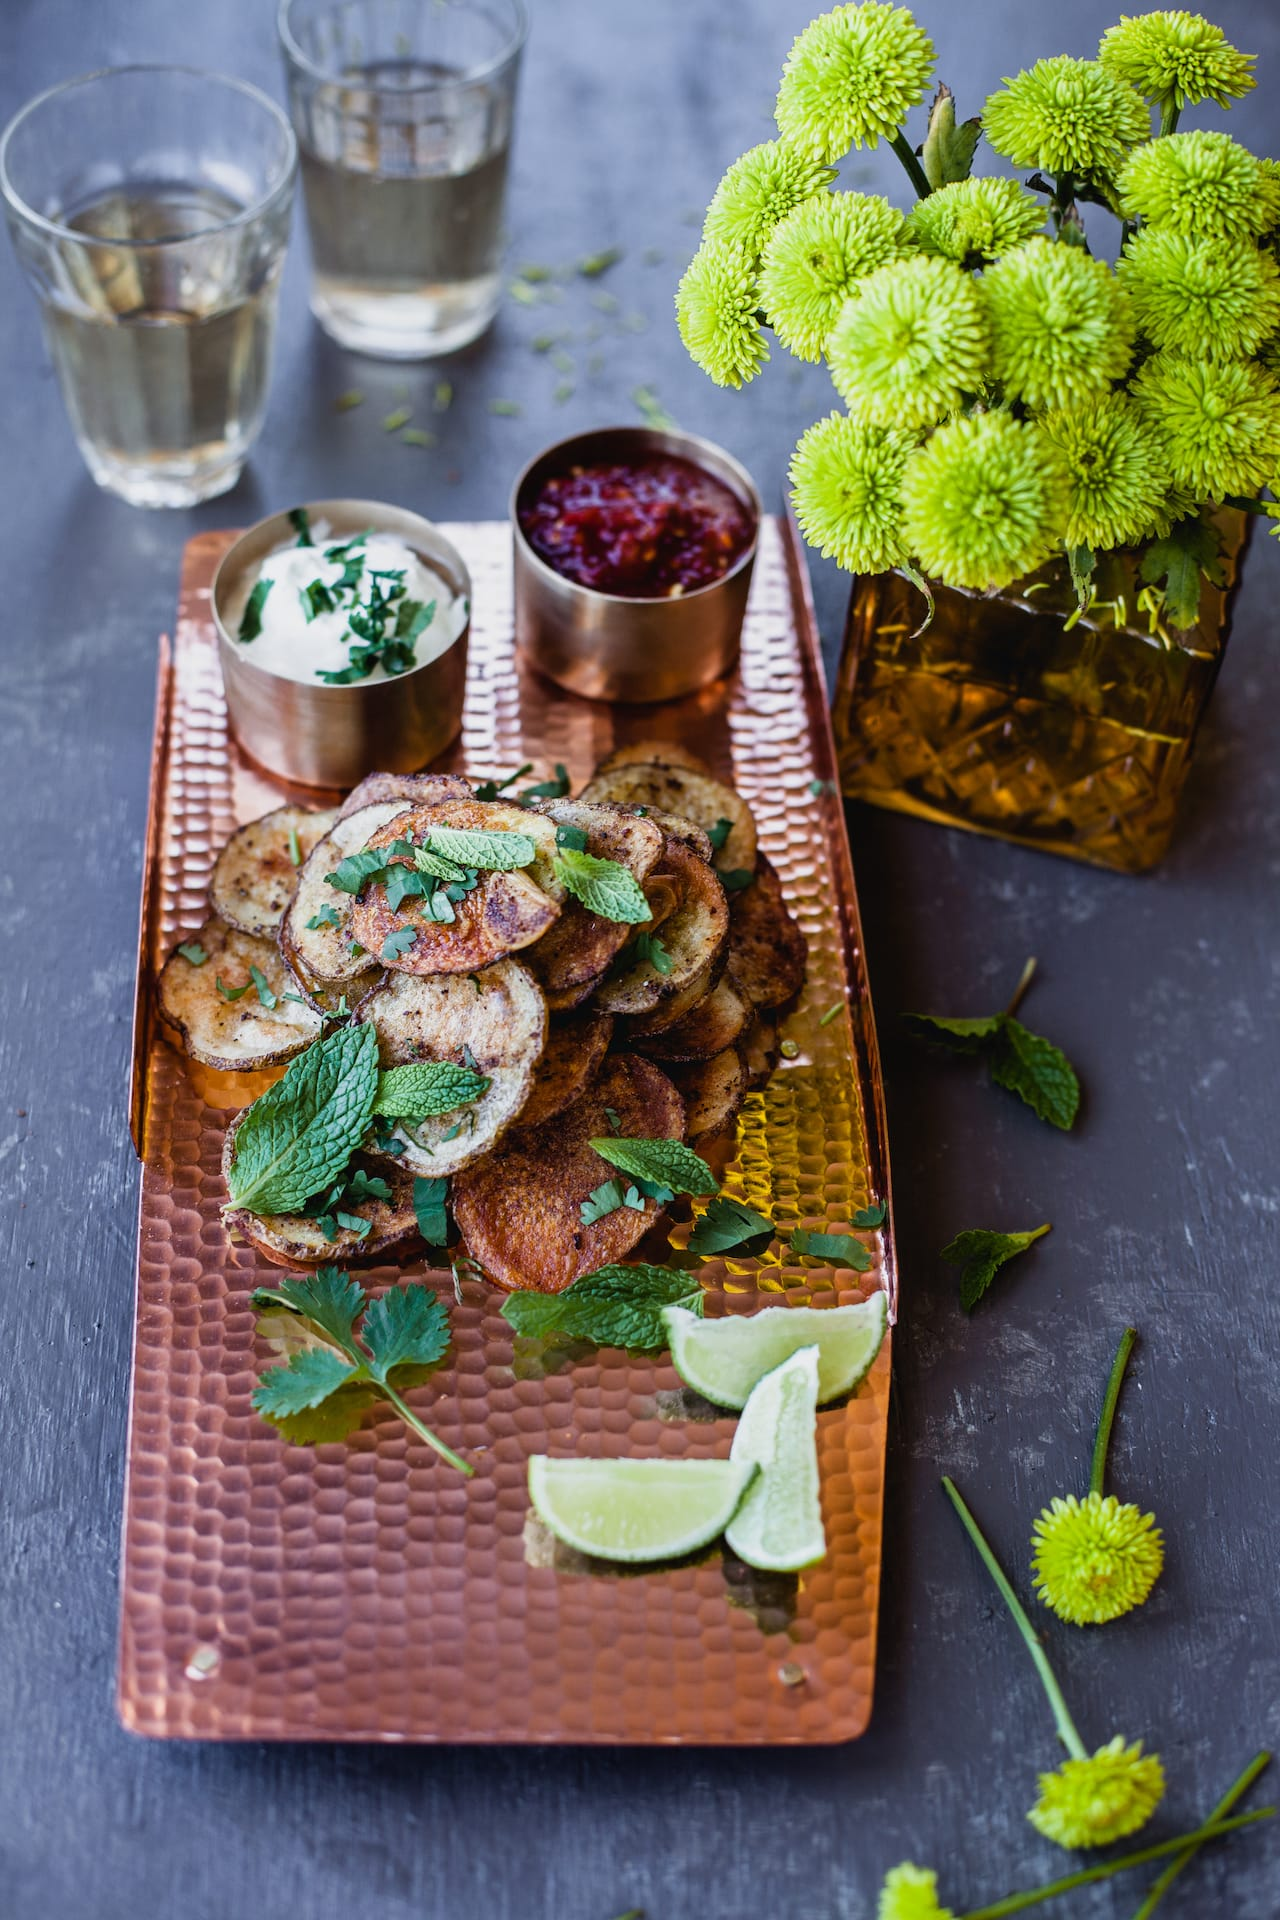 Garam Masala Baked Potato Chips | Playful Cooking #chips #baked #potato #garammasala #indian #spiced